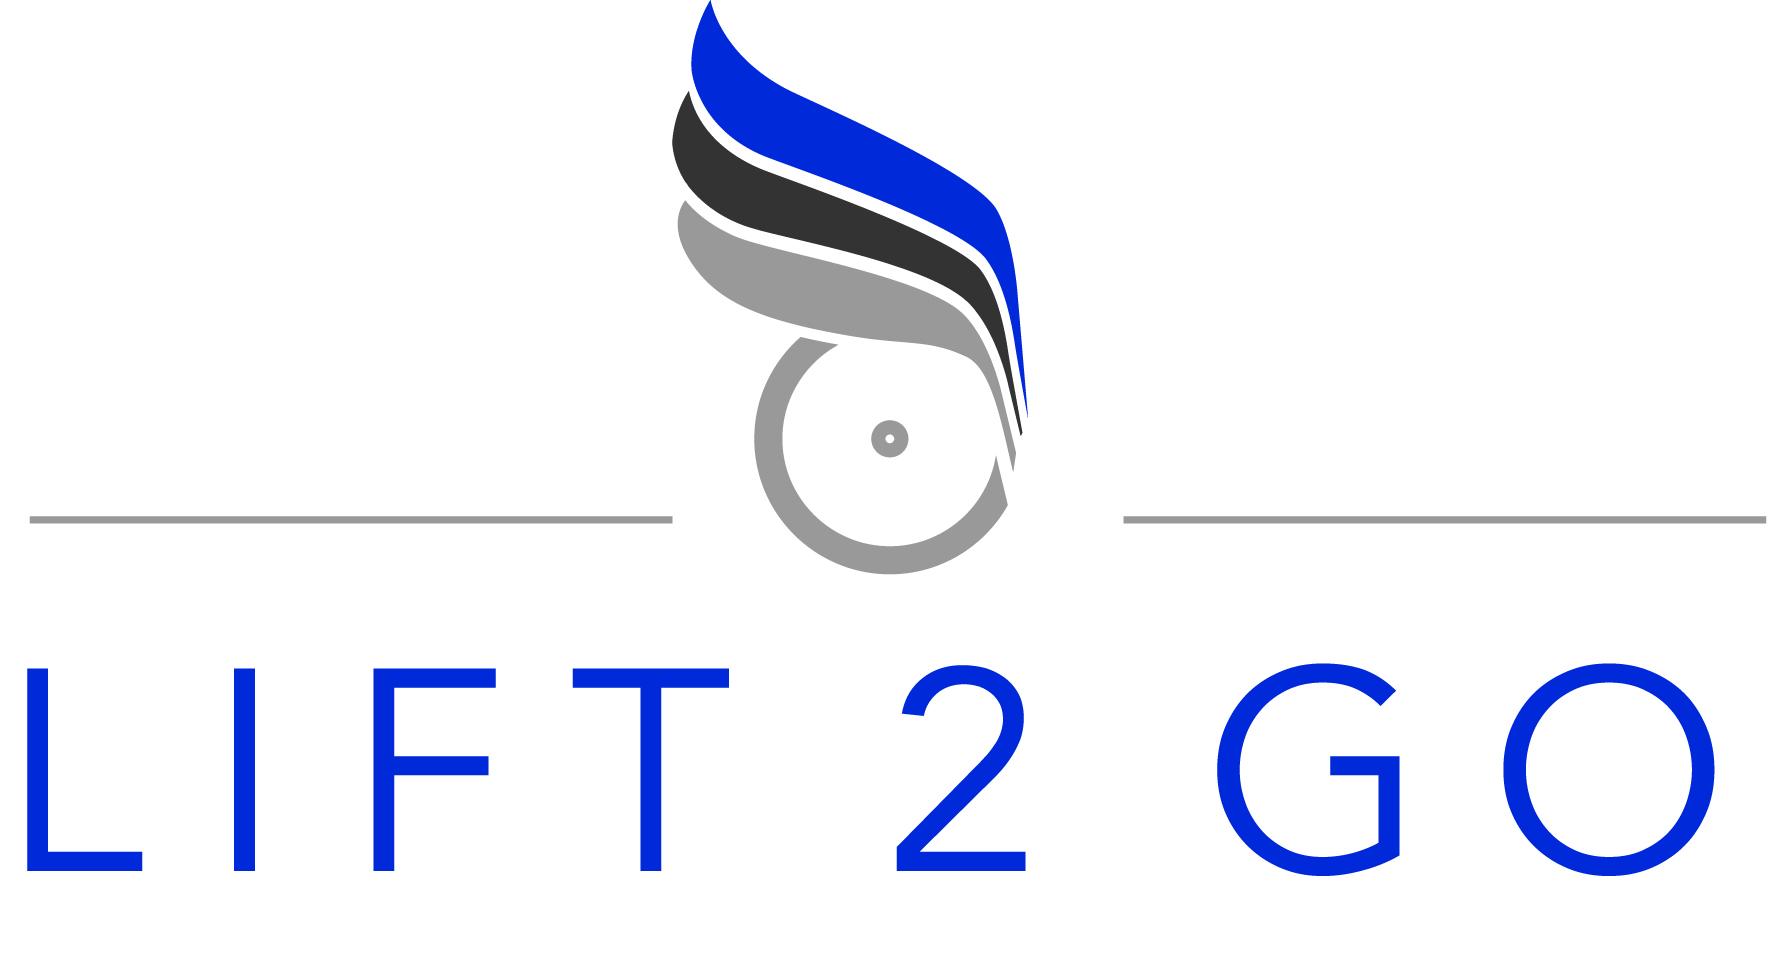 Lift2Go